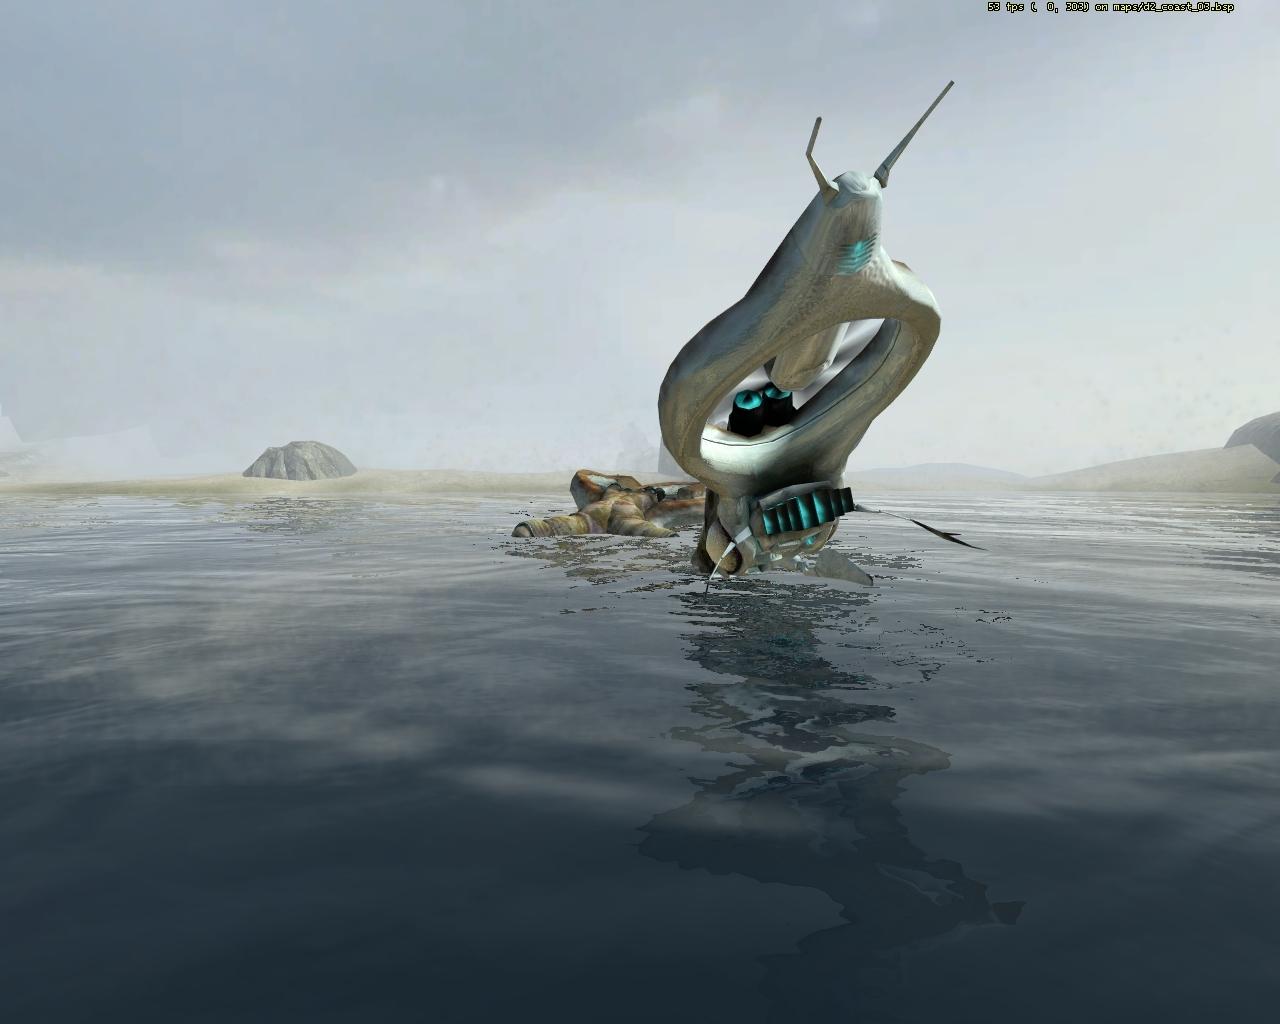 d2_coast_030071.jpg - Half-Life 2